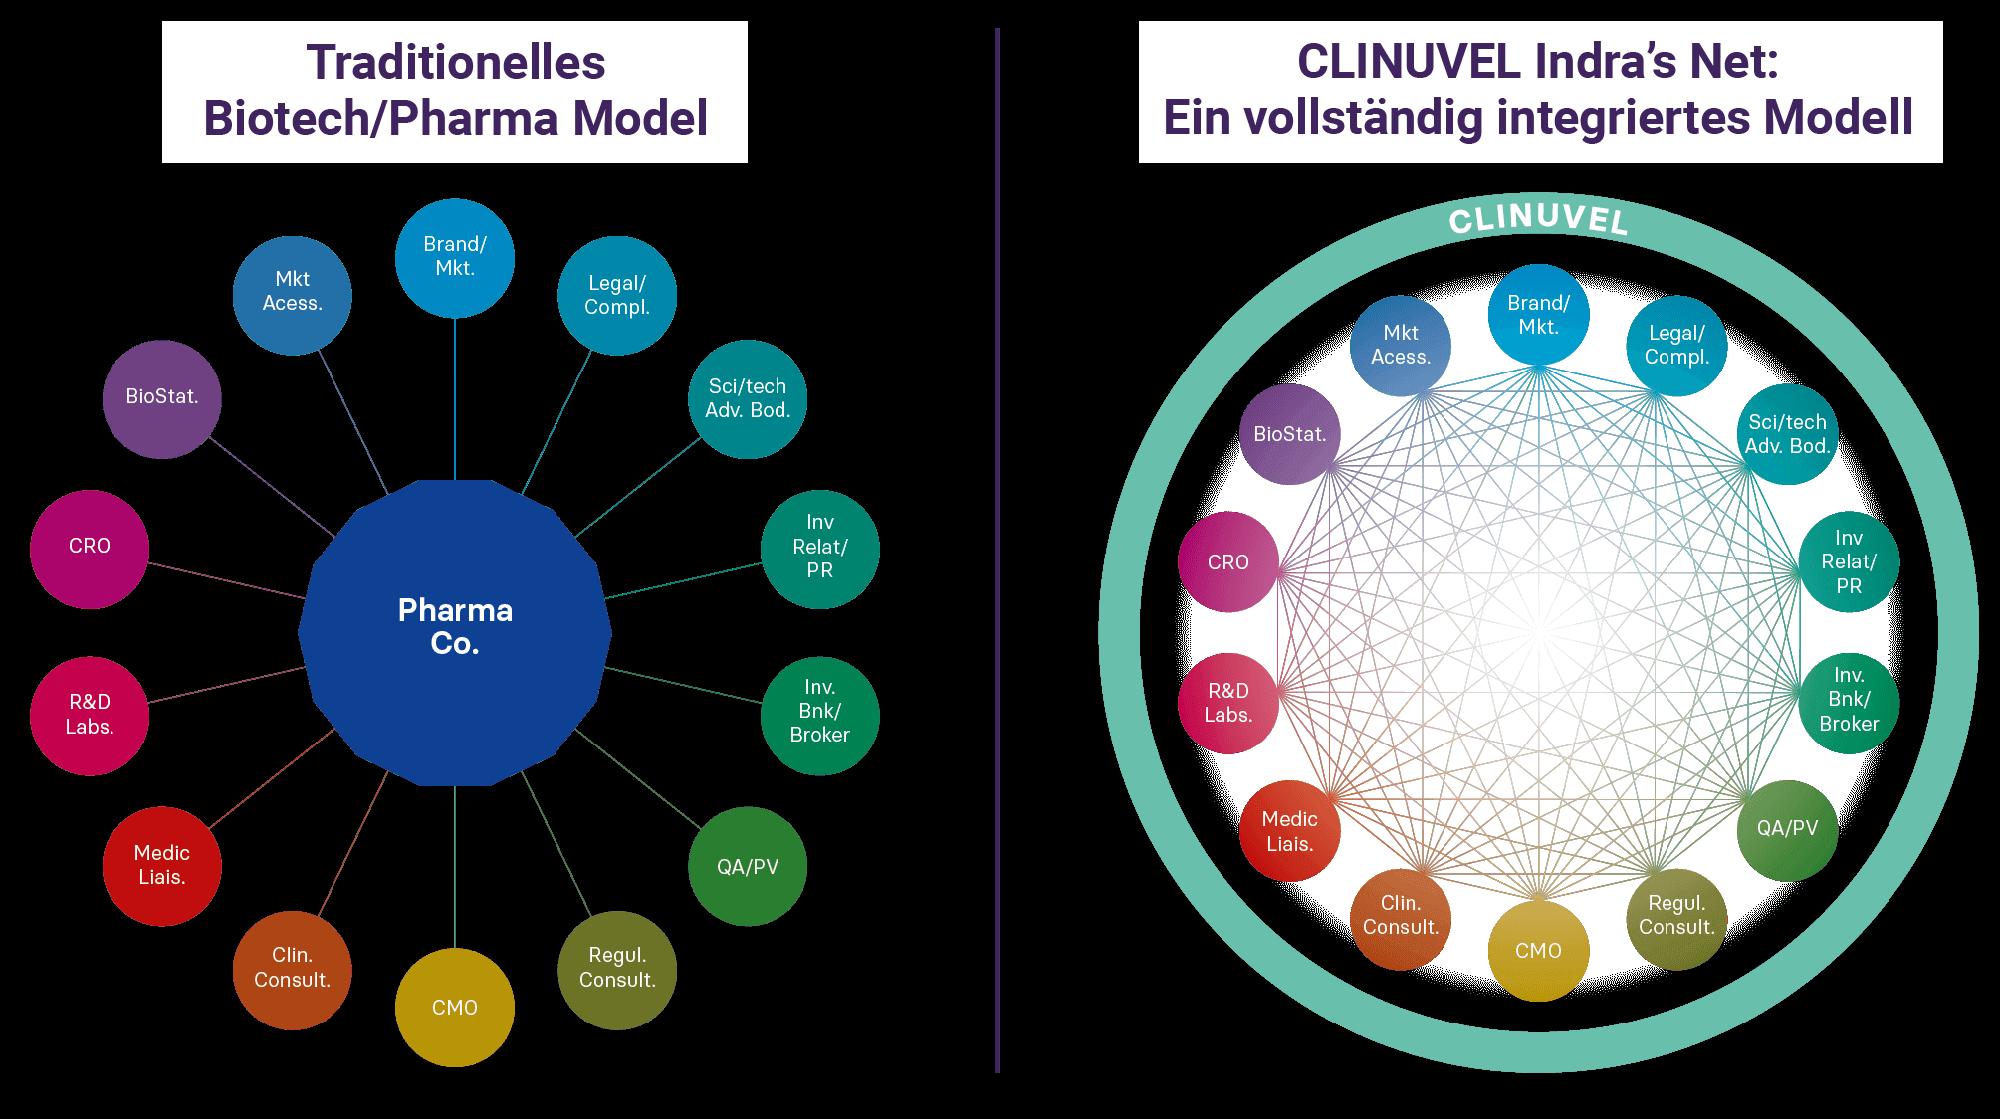 CLINUVEL Indra's Net: Ein vollständig integriertes Modell